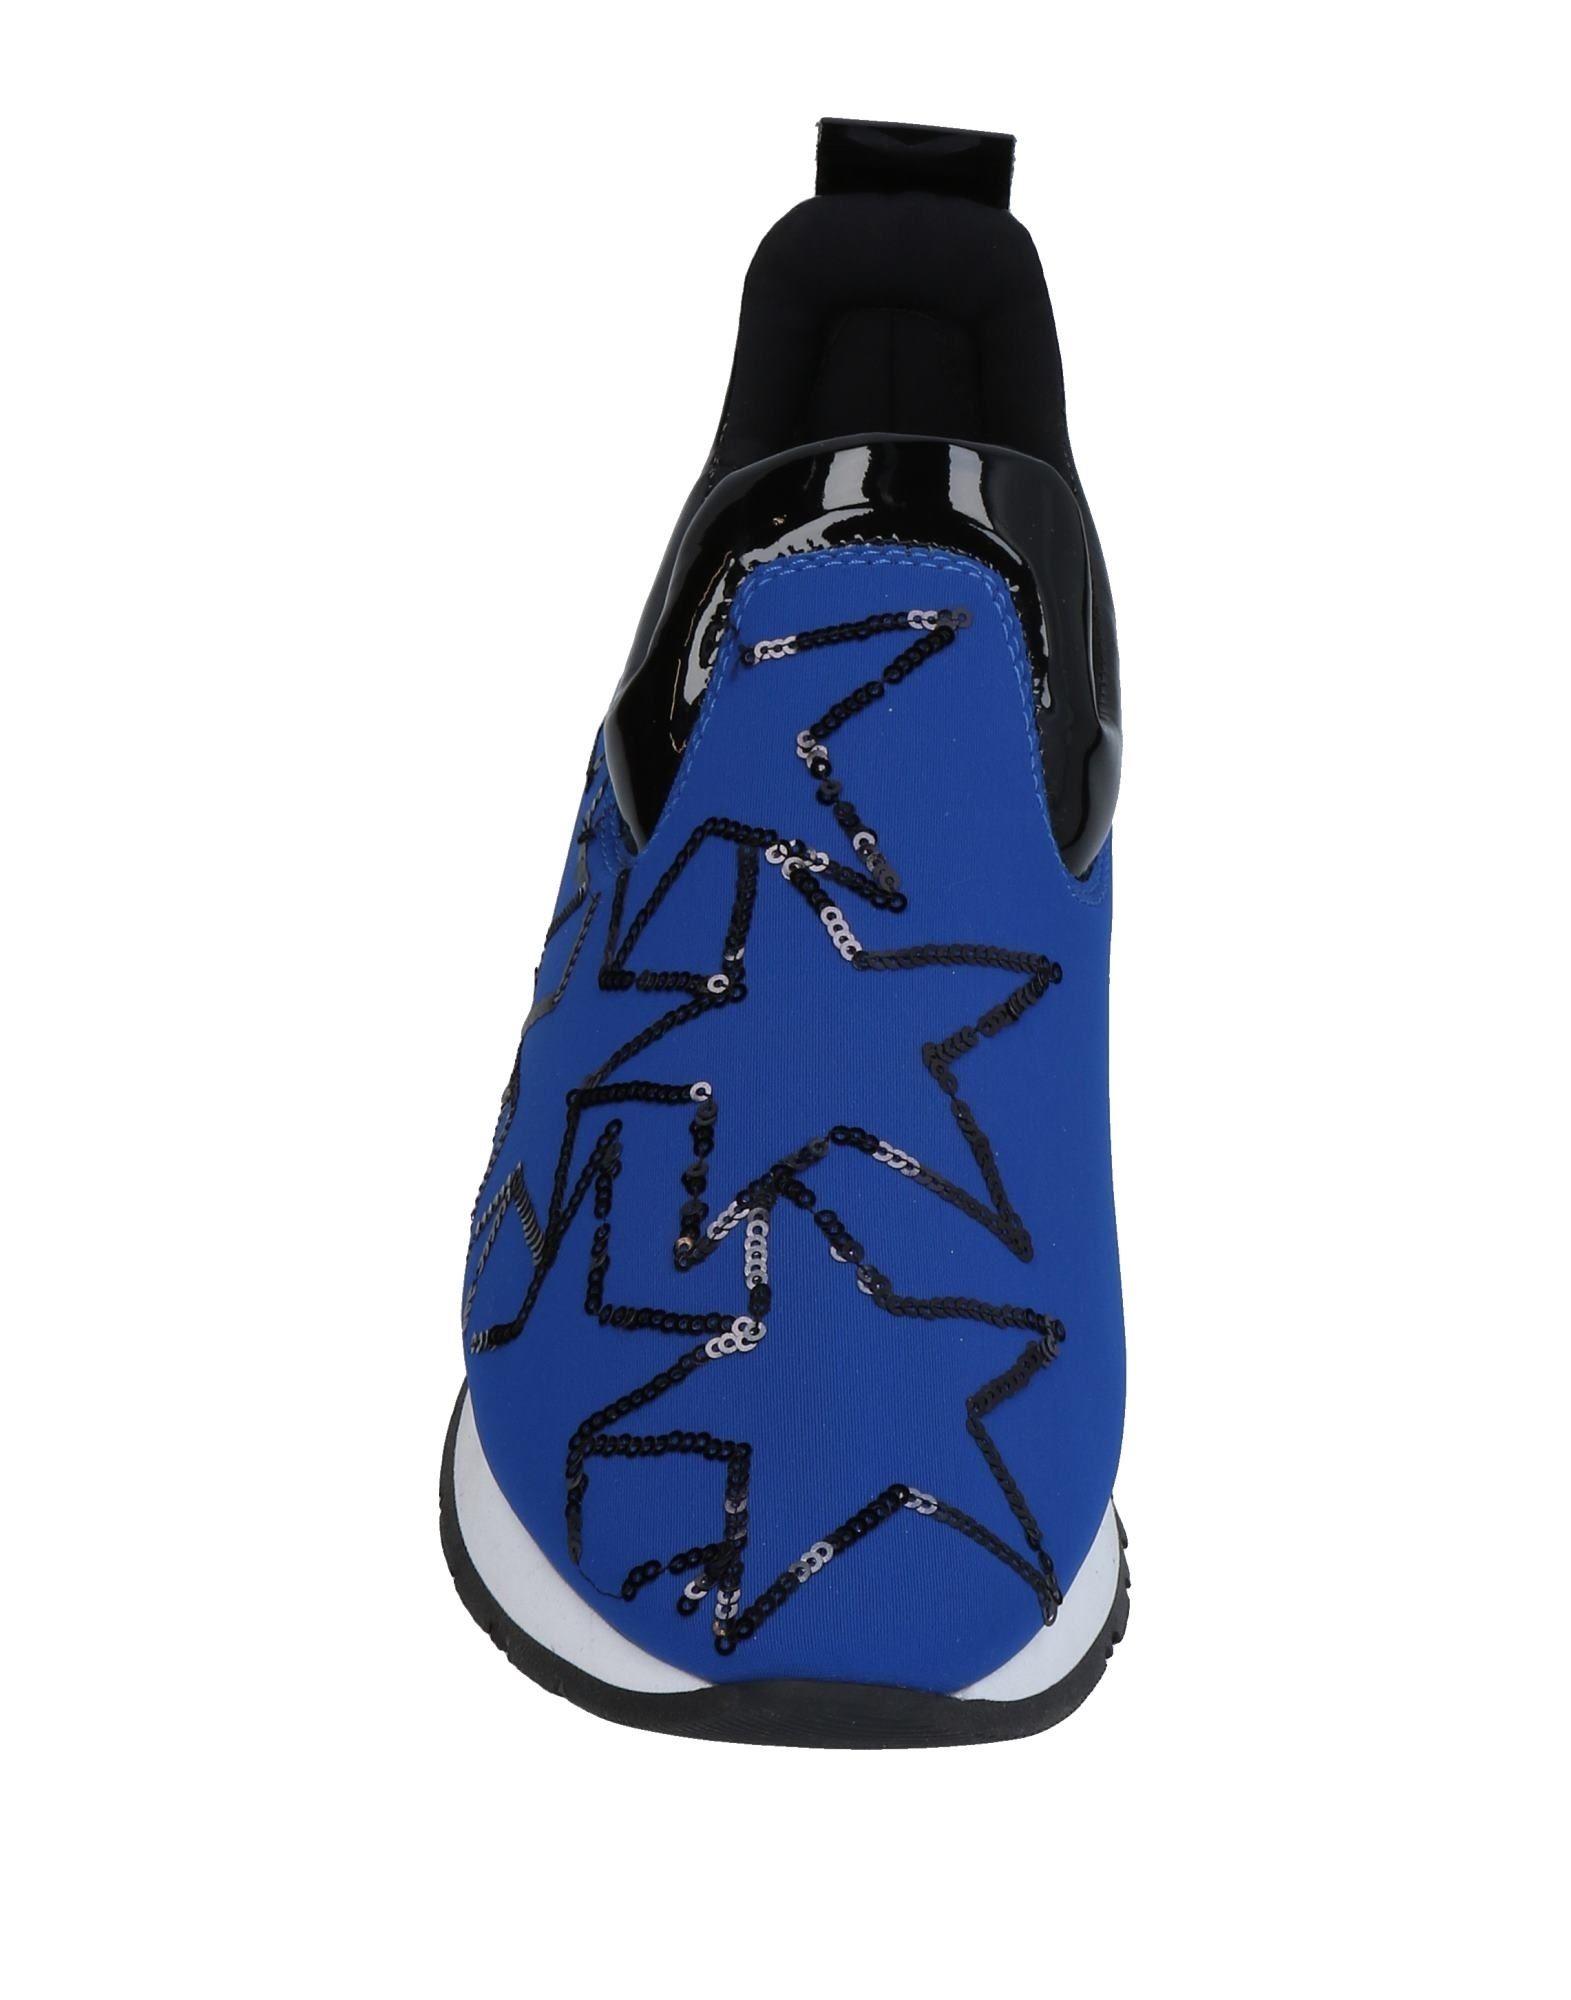 Stilvolle billige Schuhe 11463327LU Bikkembergs Sneakers Damen  11463327LU Schuhe 8d0d18